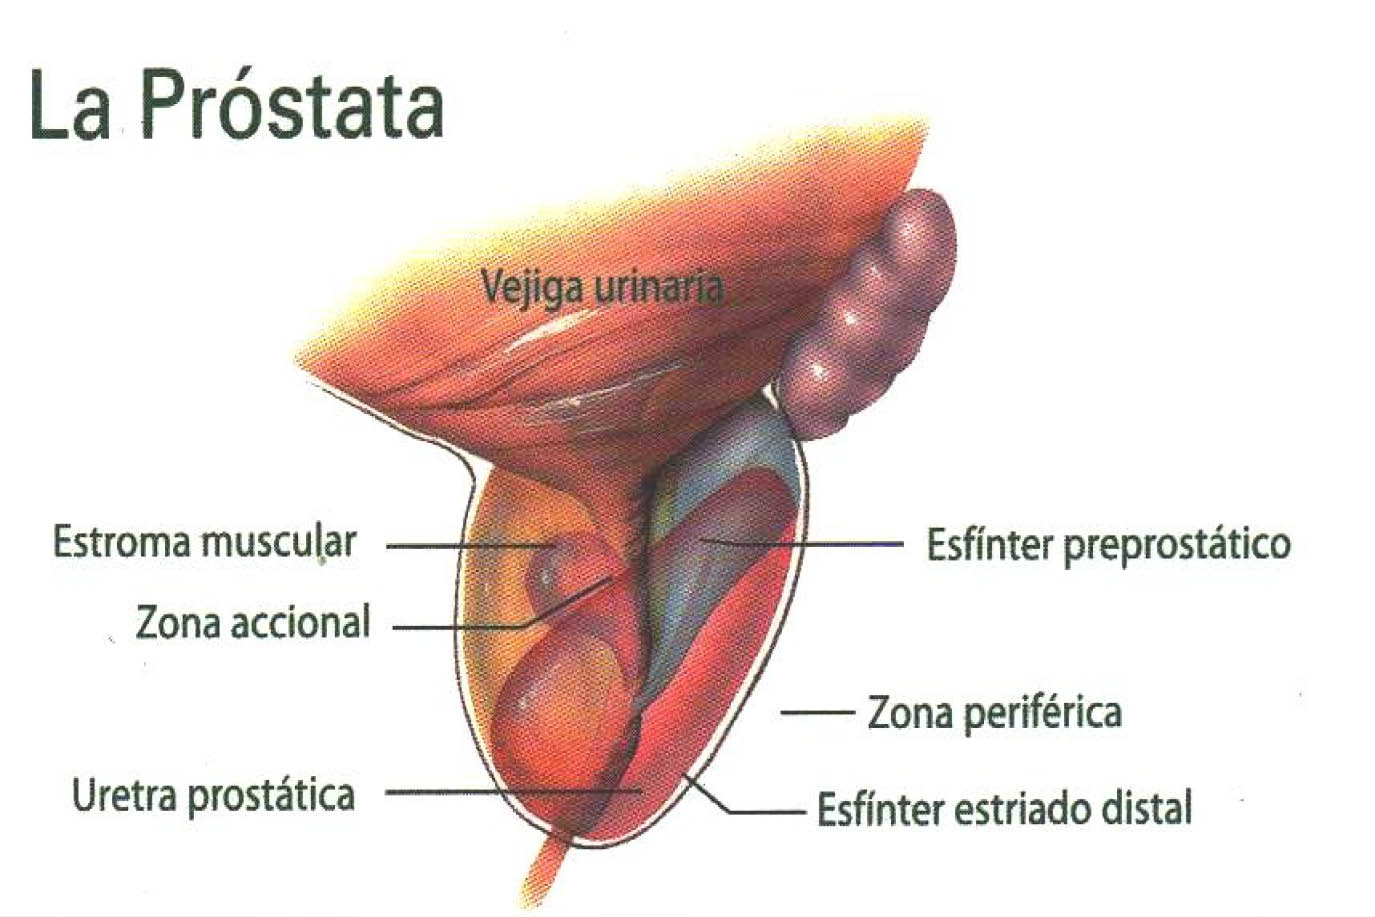 Anatomía de la próstata -